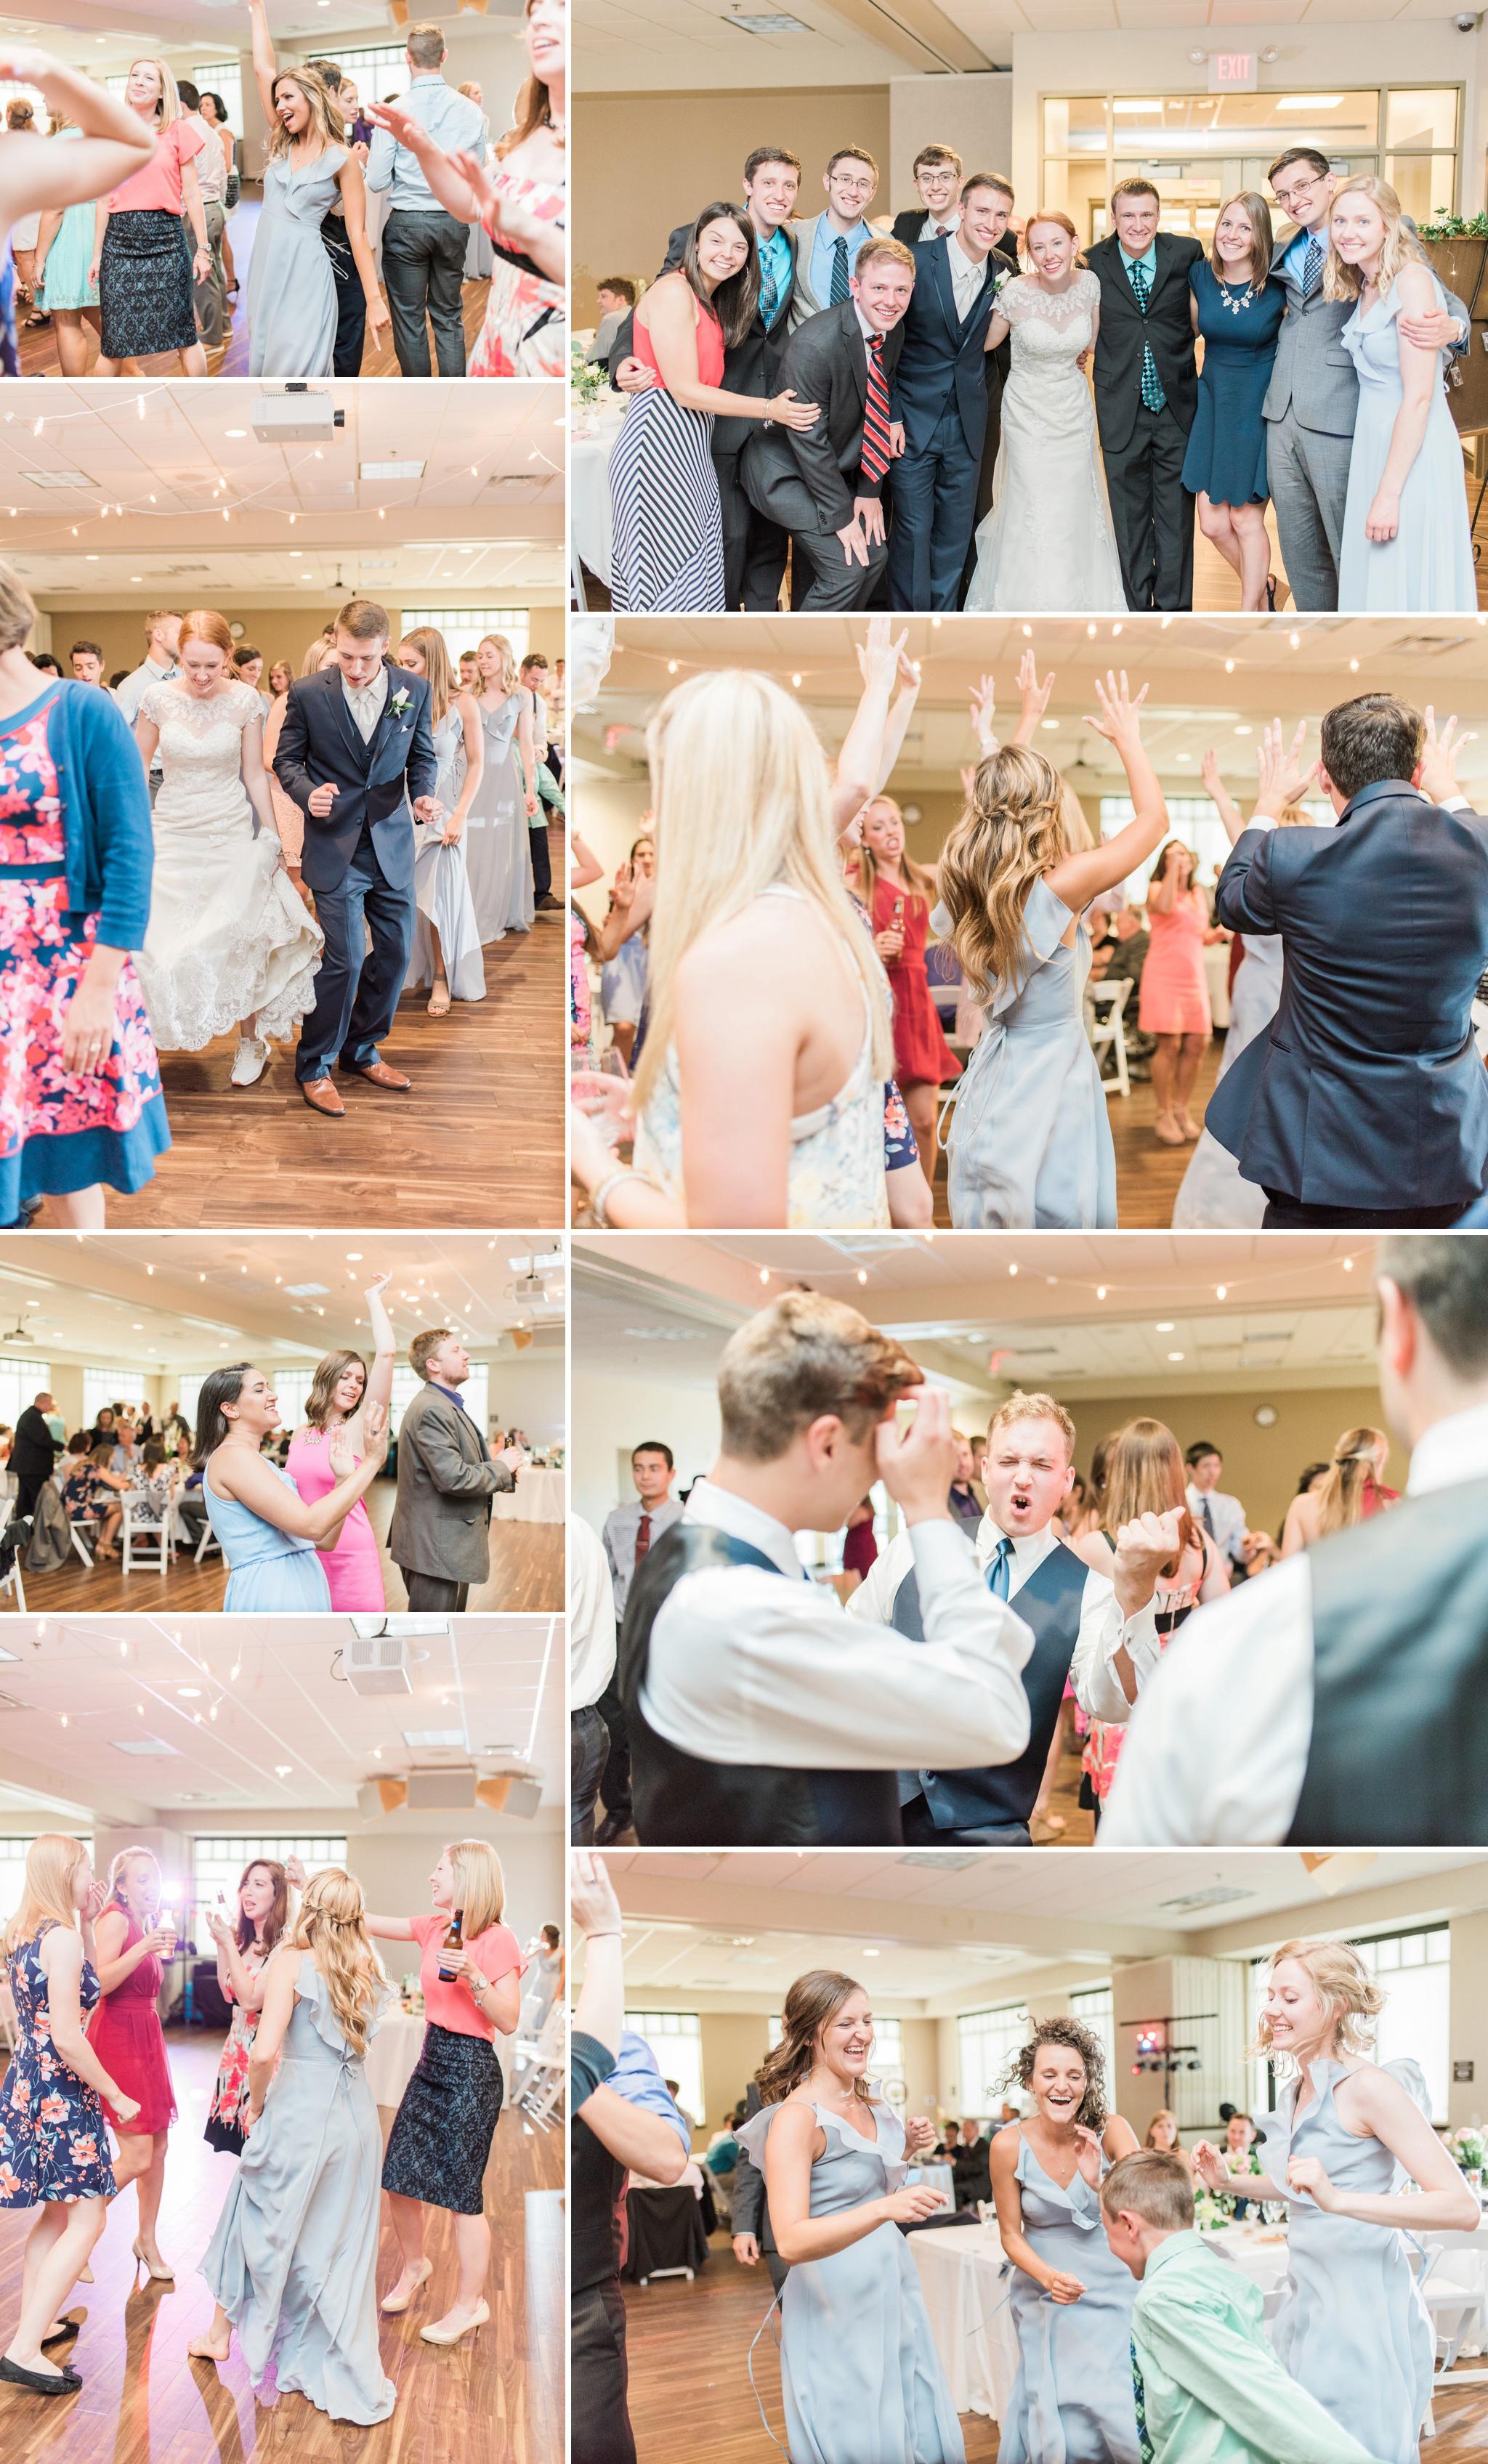 sunbury-ohio-wedding-hannah-johnathan_0148.jpg